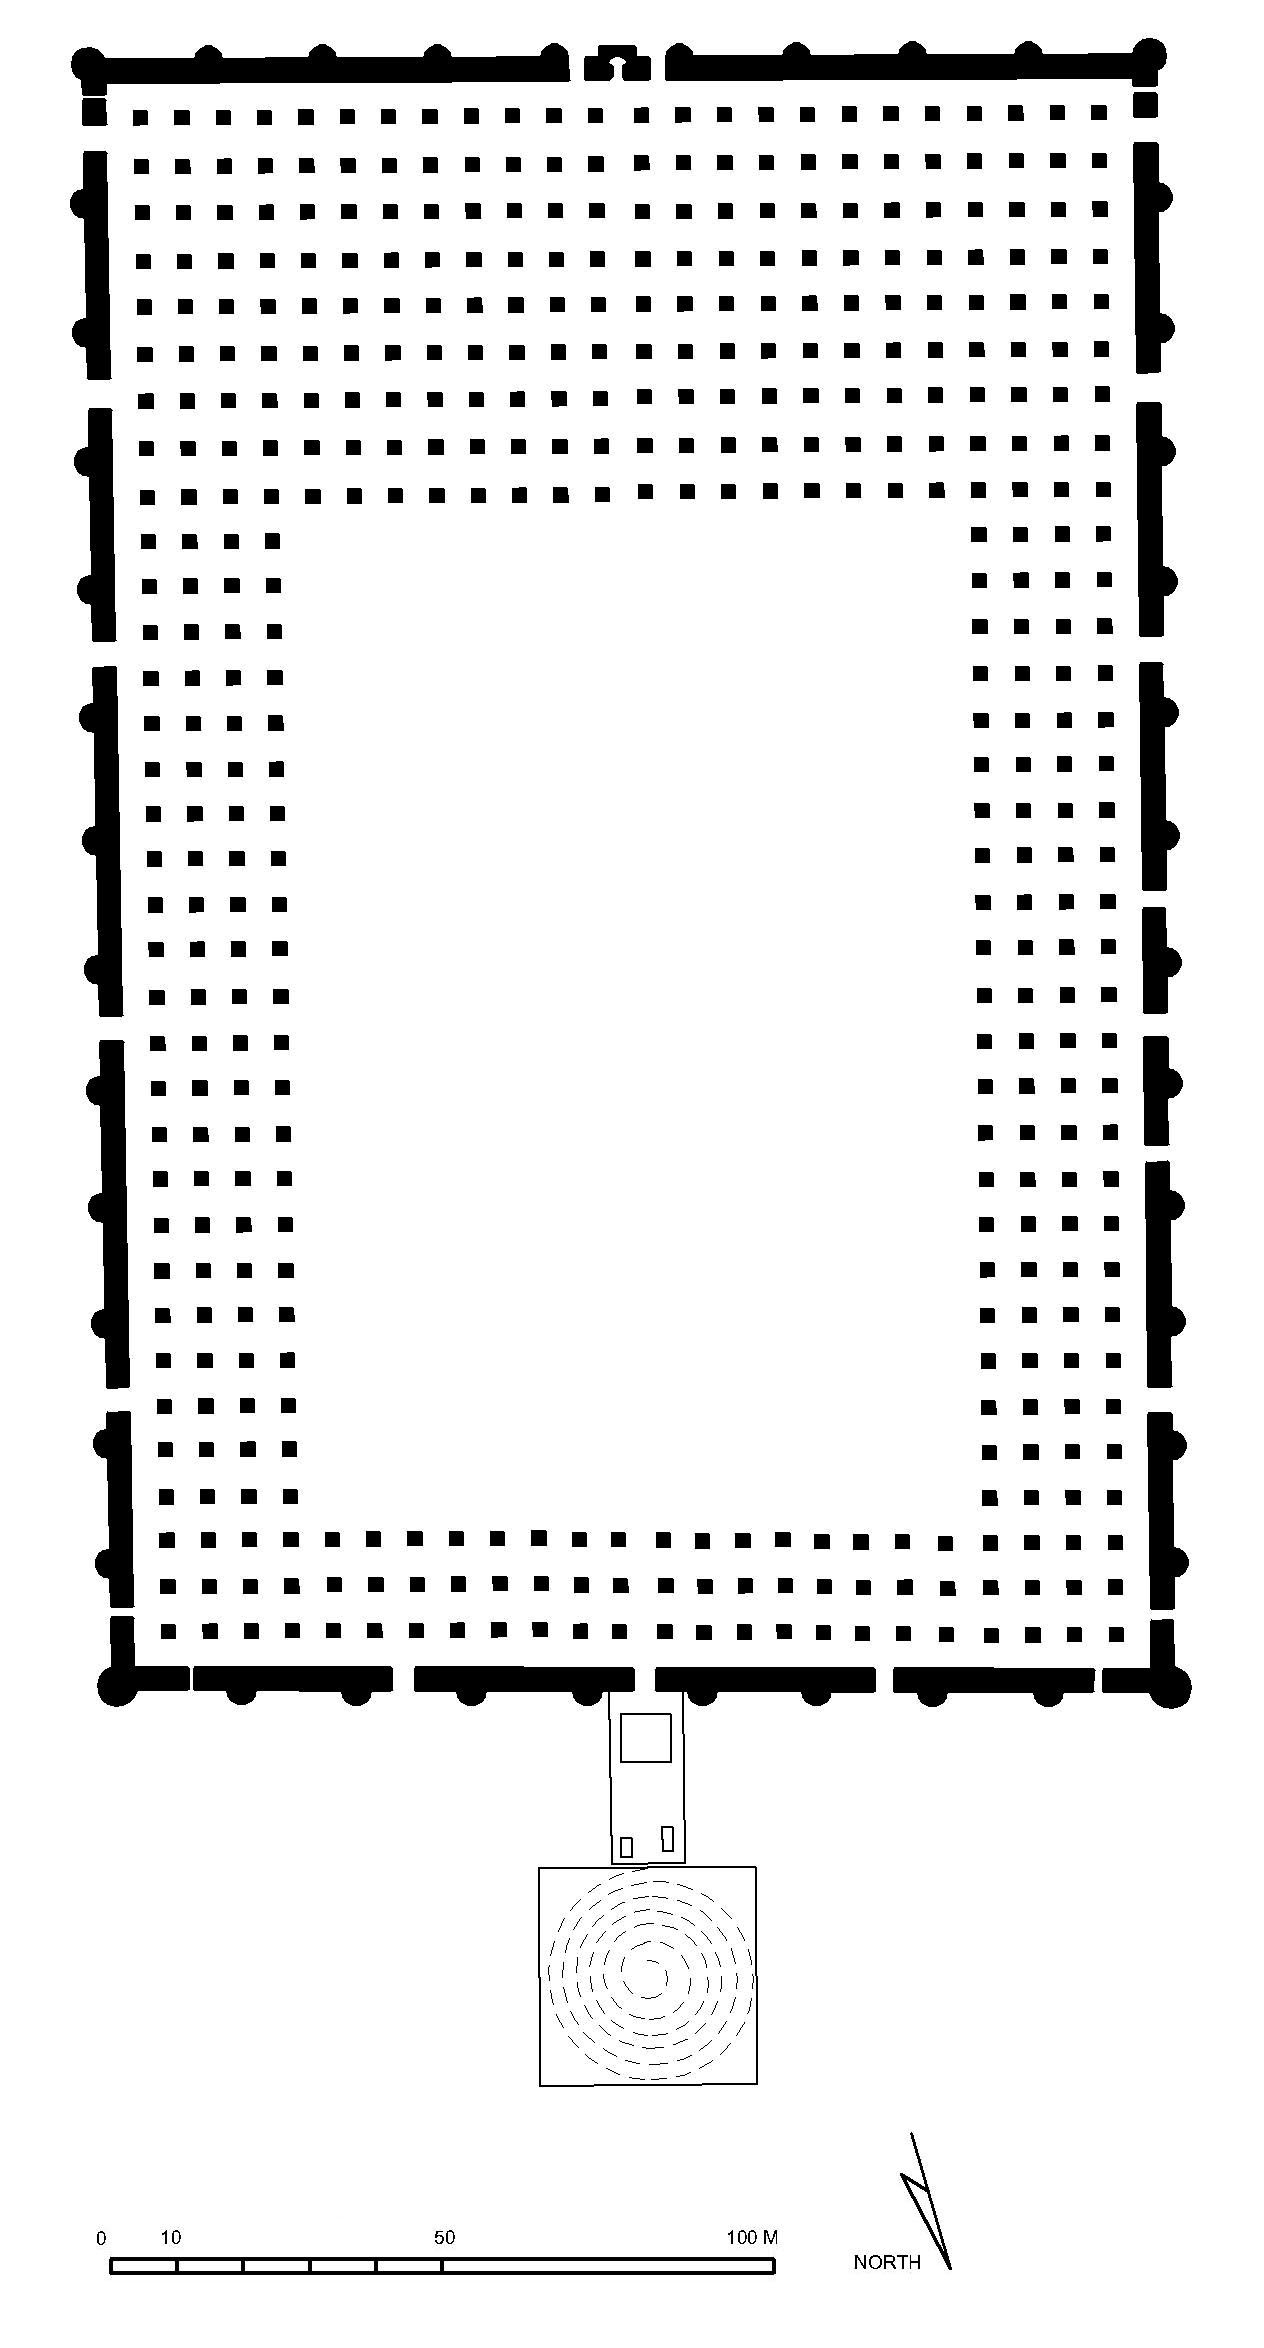 Floor plan of Mosque of Mutawakkil, Samarra | Archnet